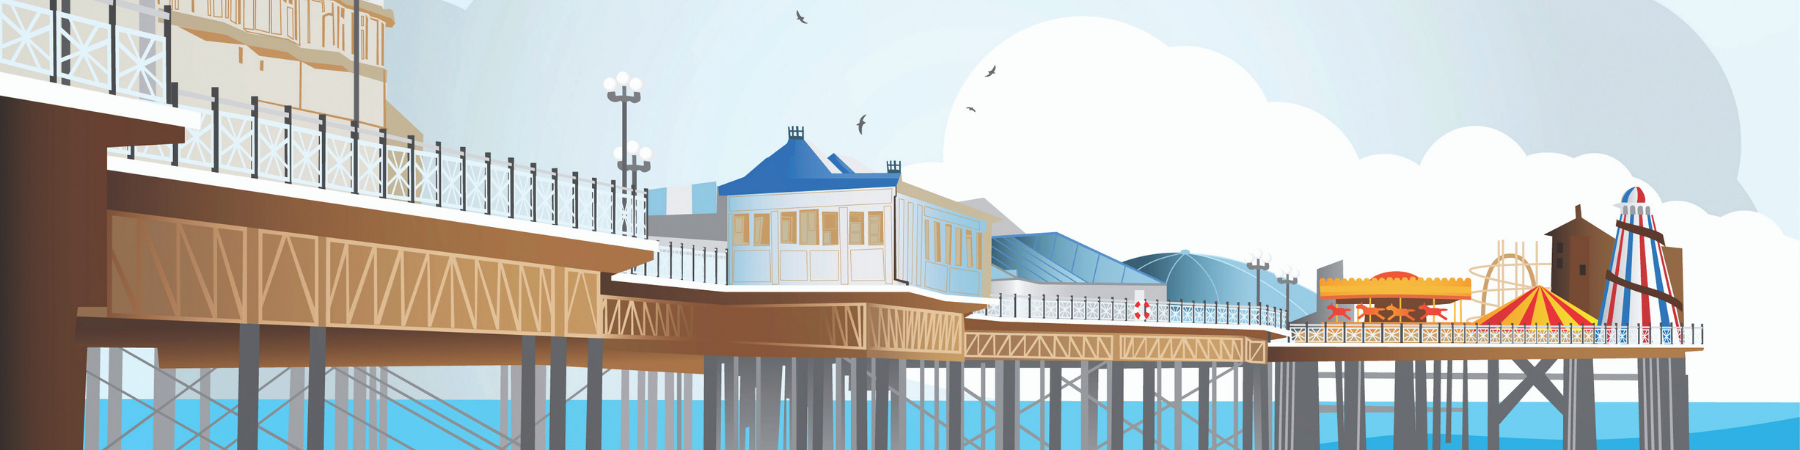 Brighton Pier Art